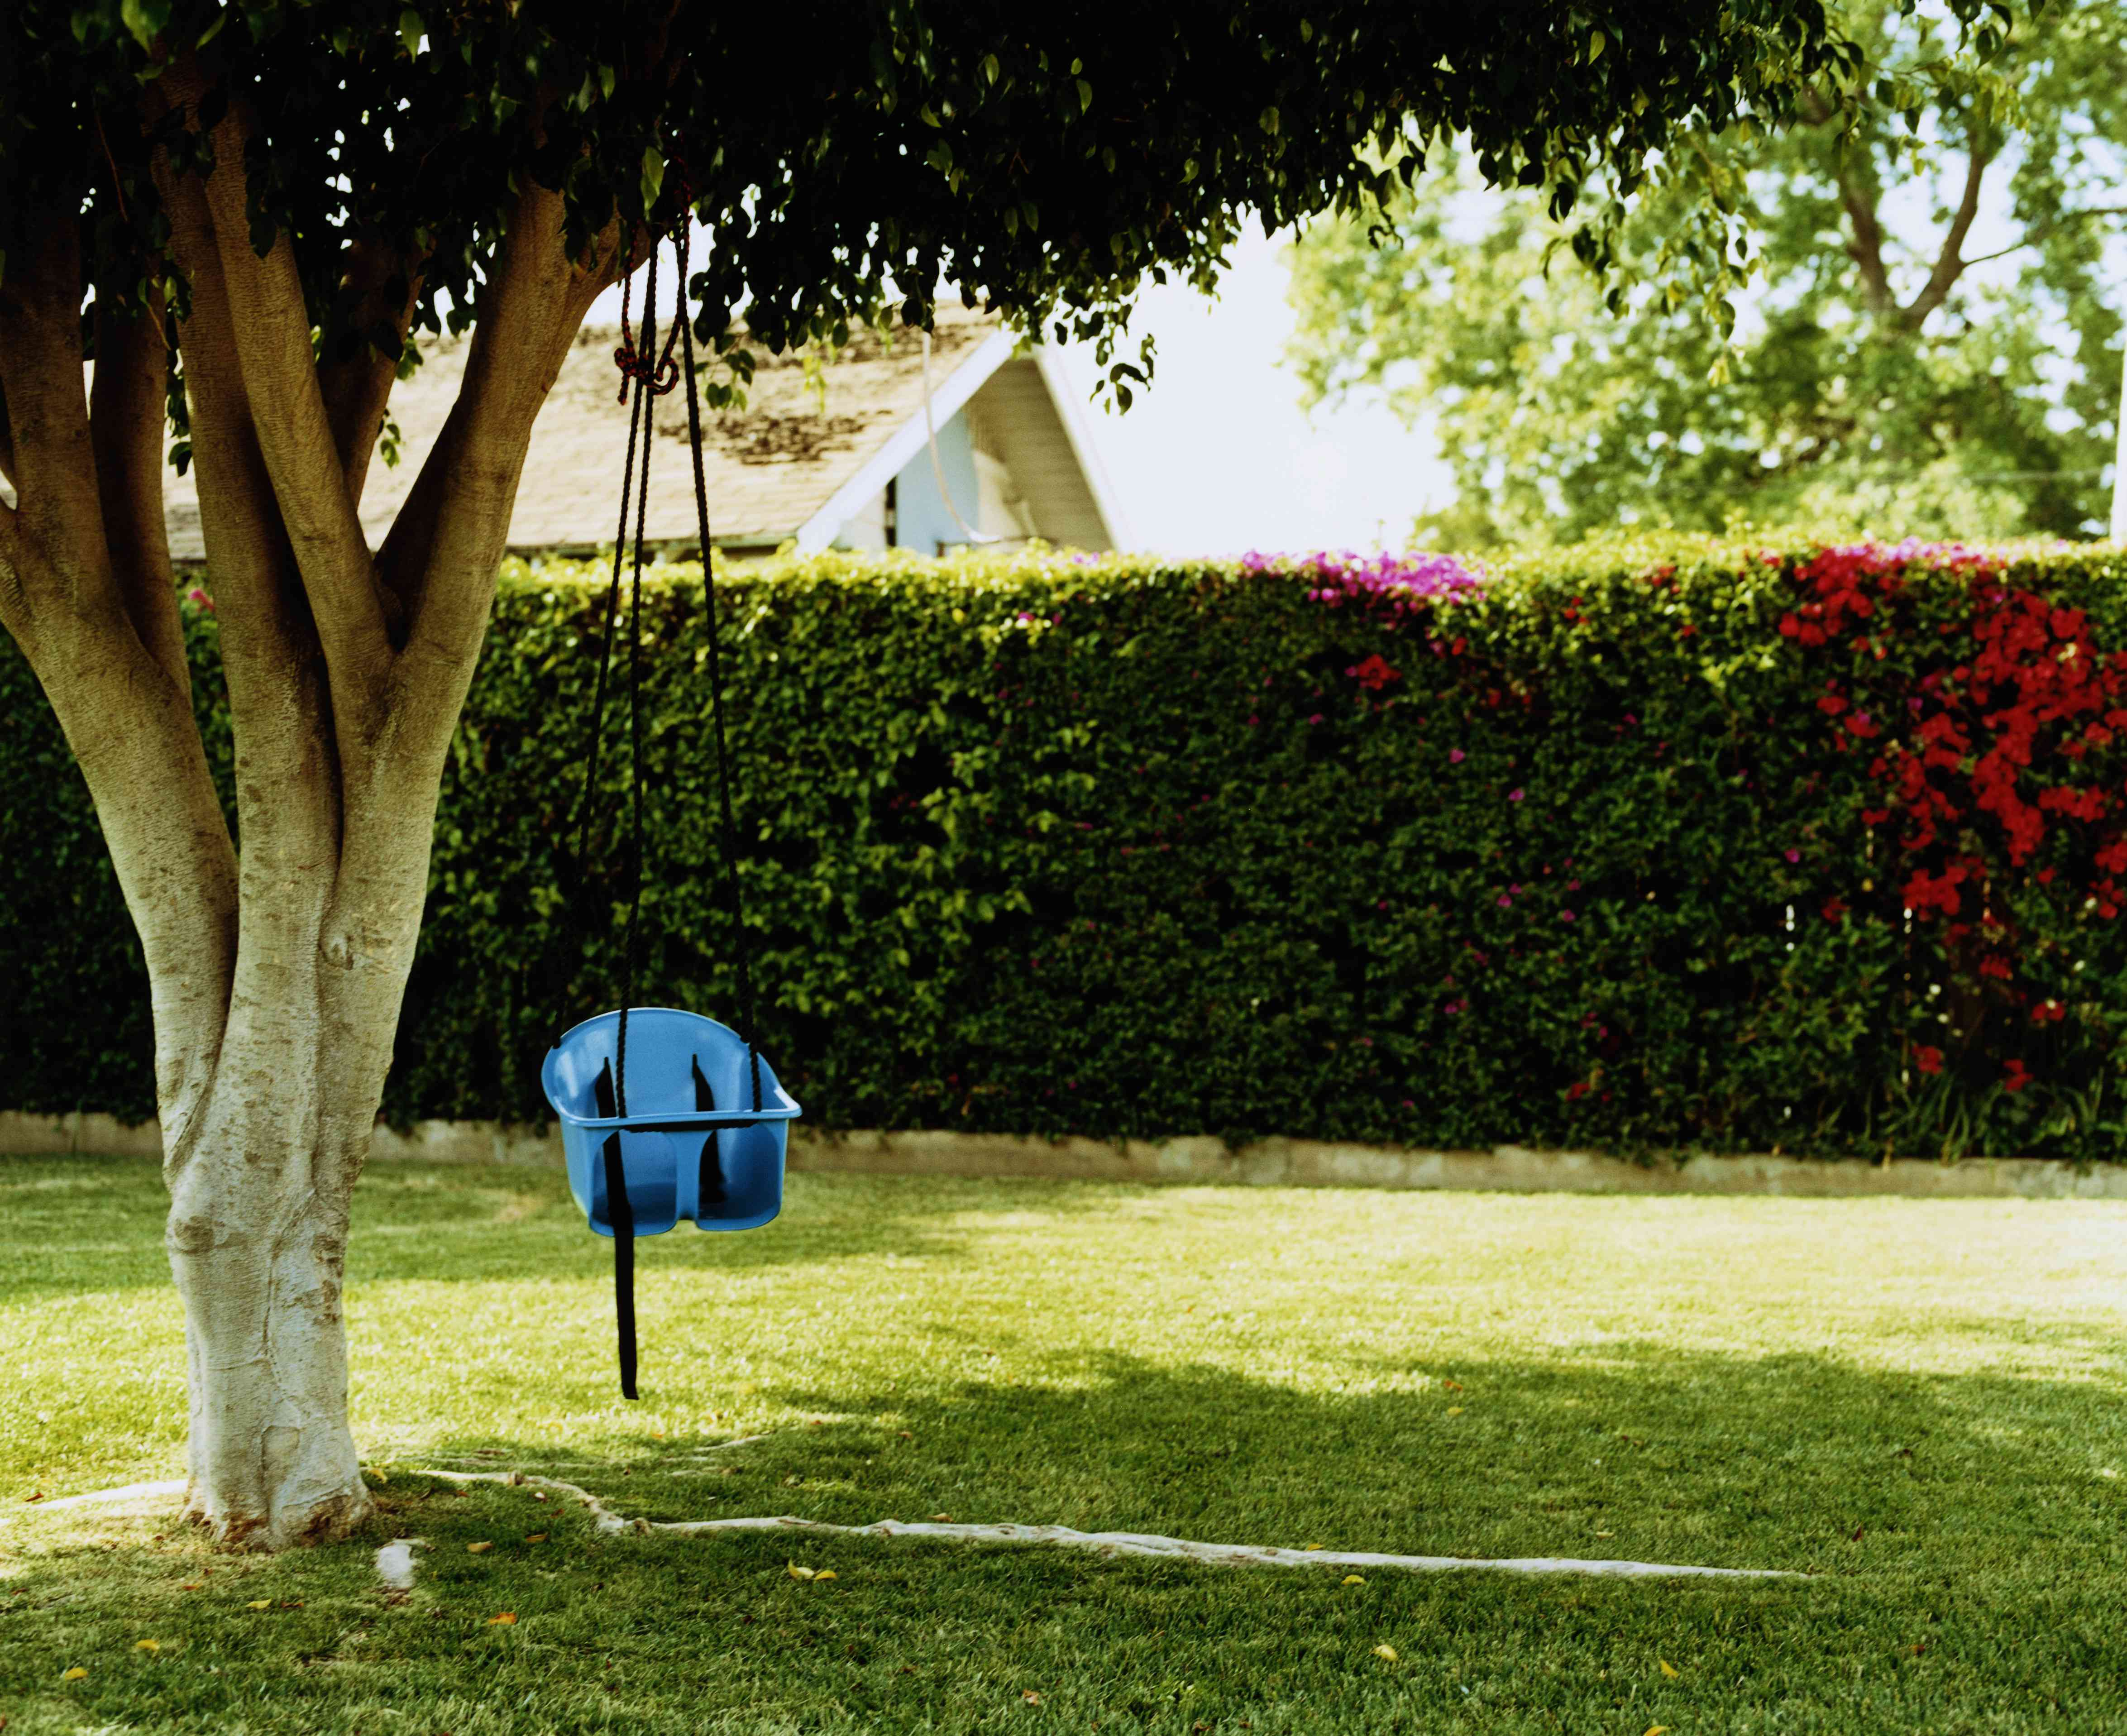 Make a Private Backyard